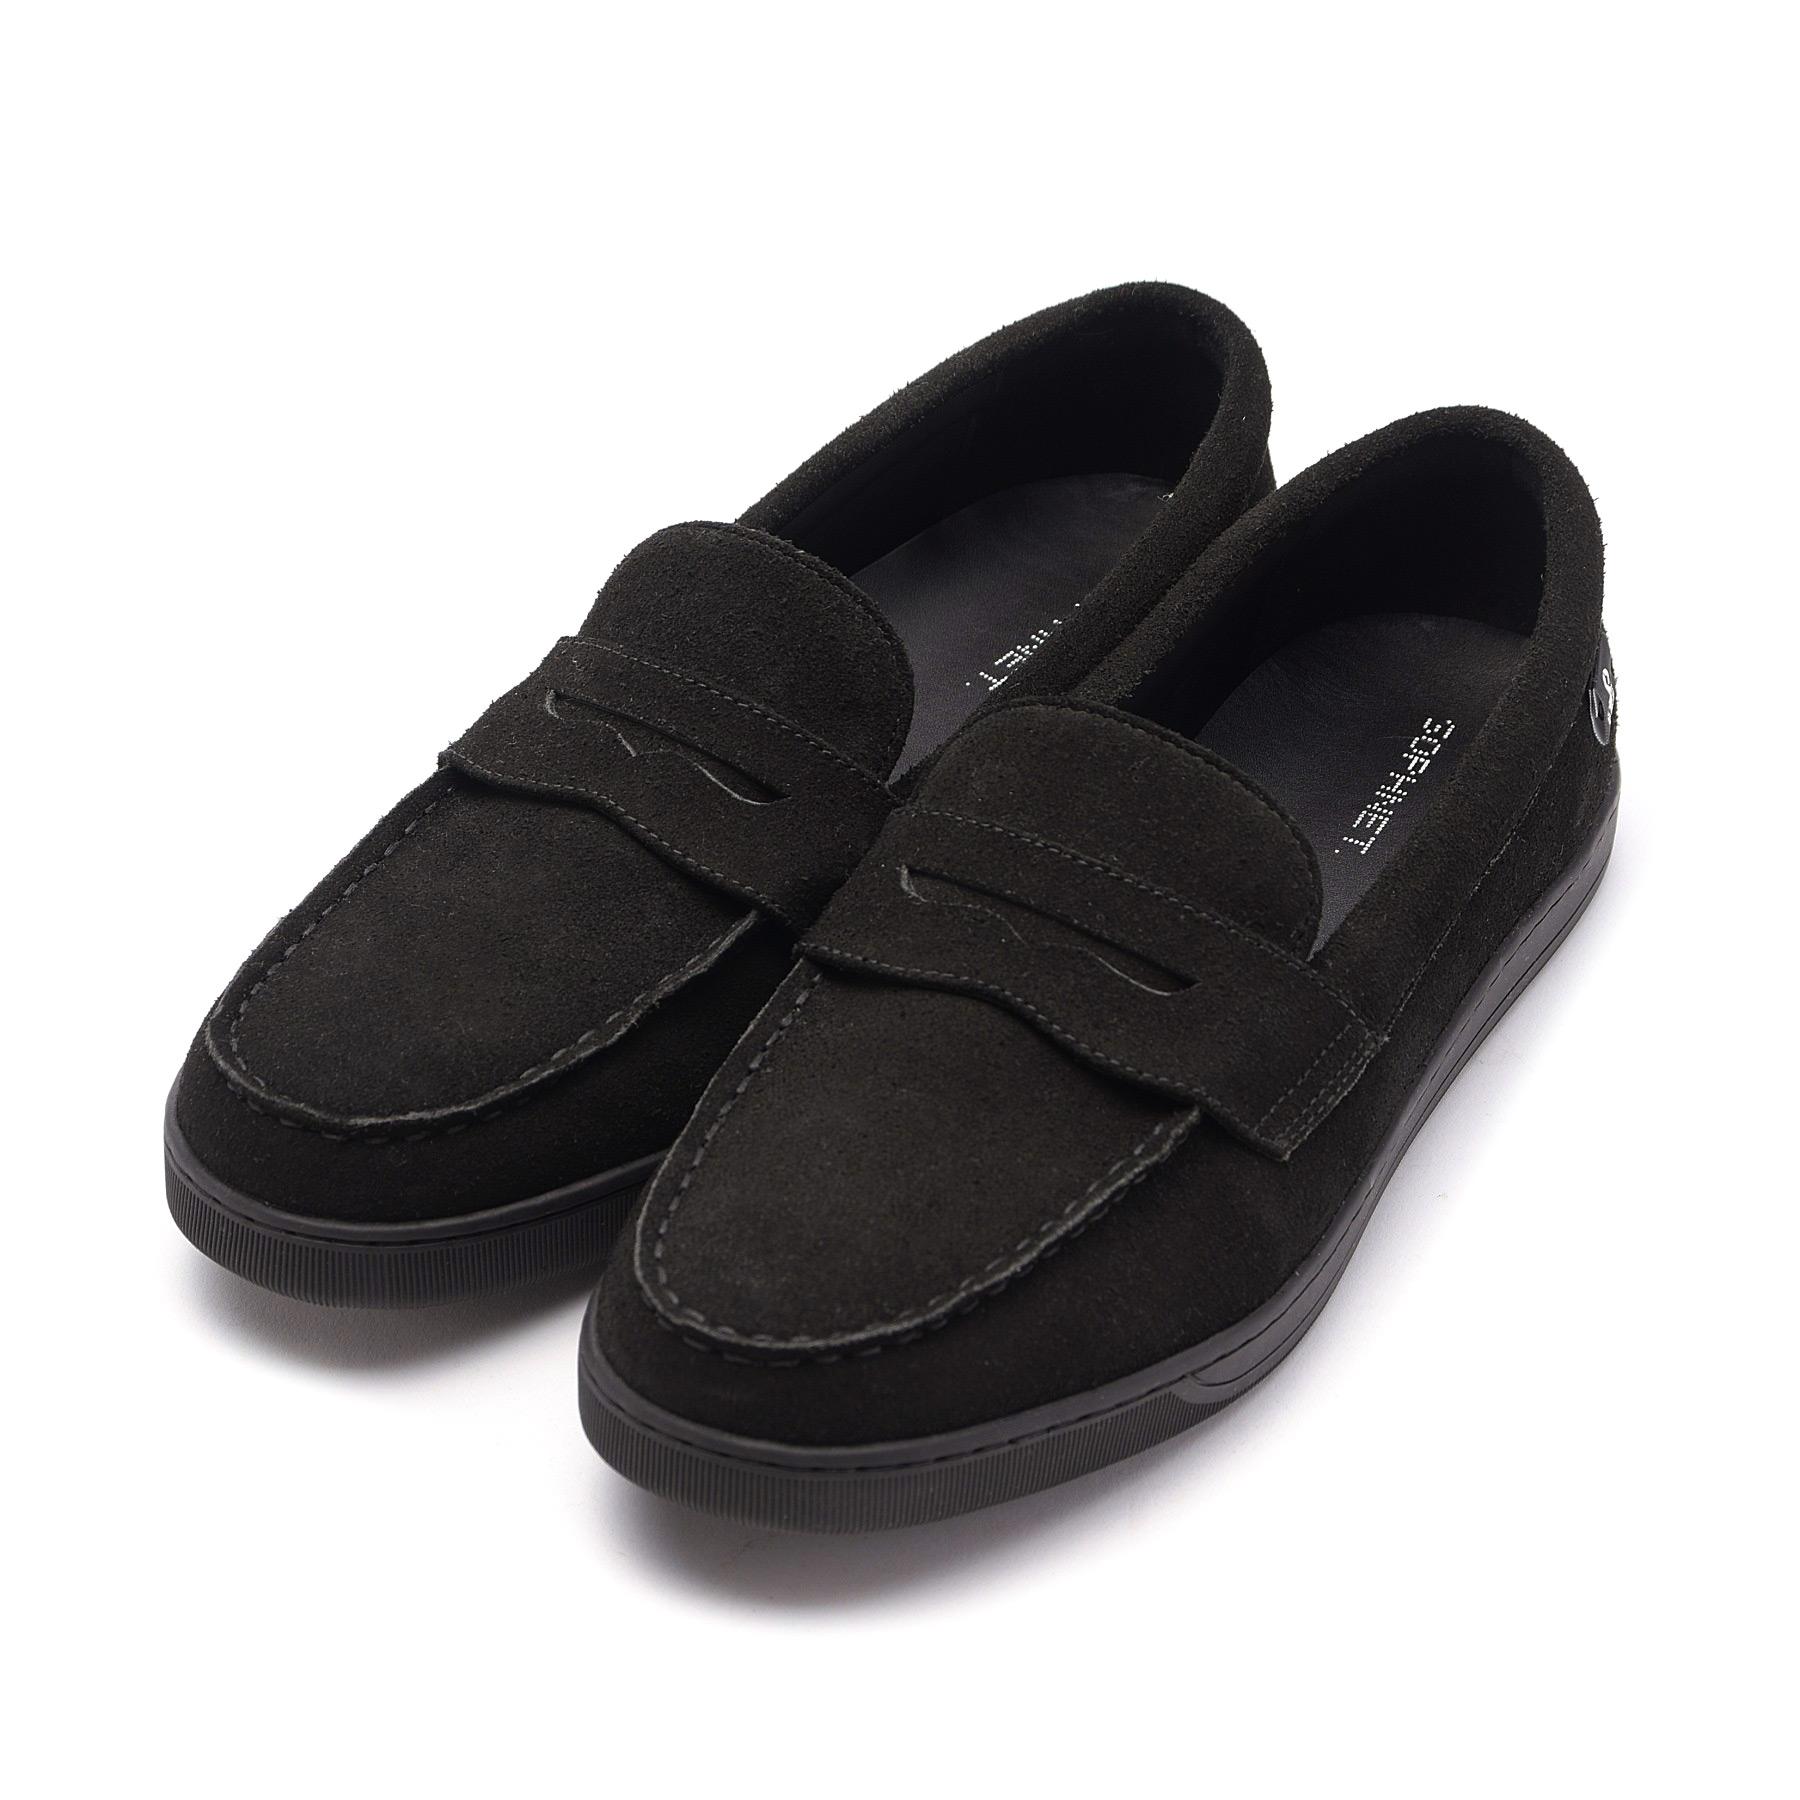 SOPHNET. / LOAFER SNEAKERS (Black)